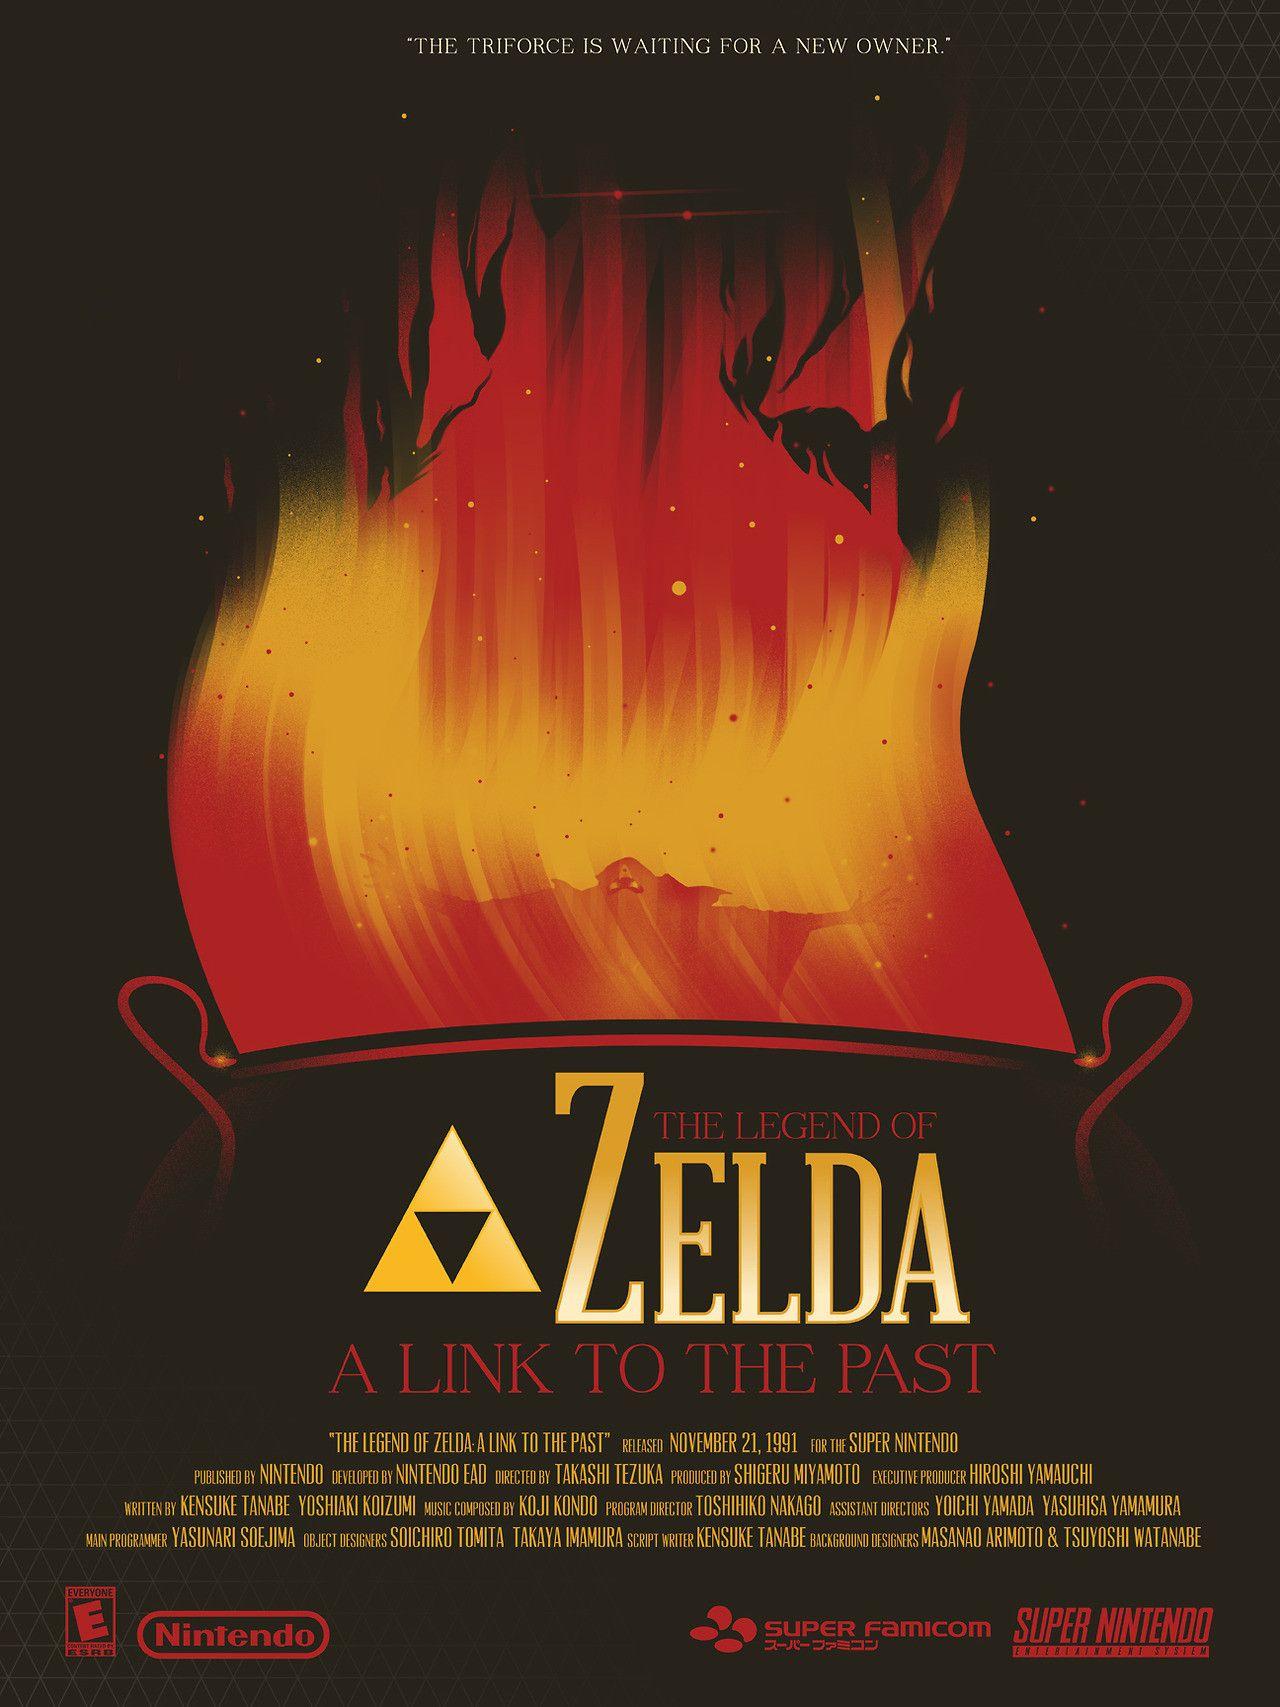 Fantastic Legend of Zelda posters created by Marinko Milosevski - Imgur